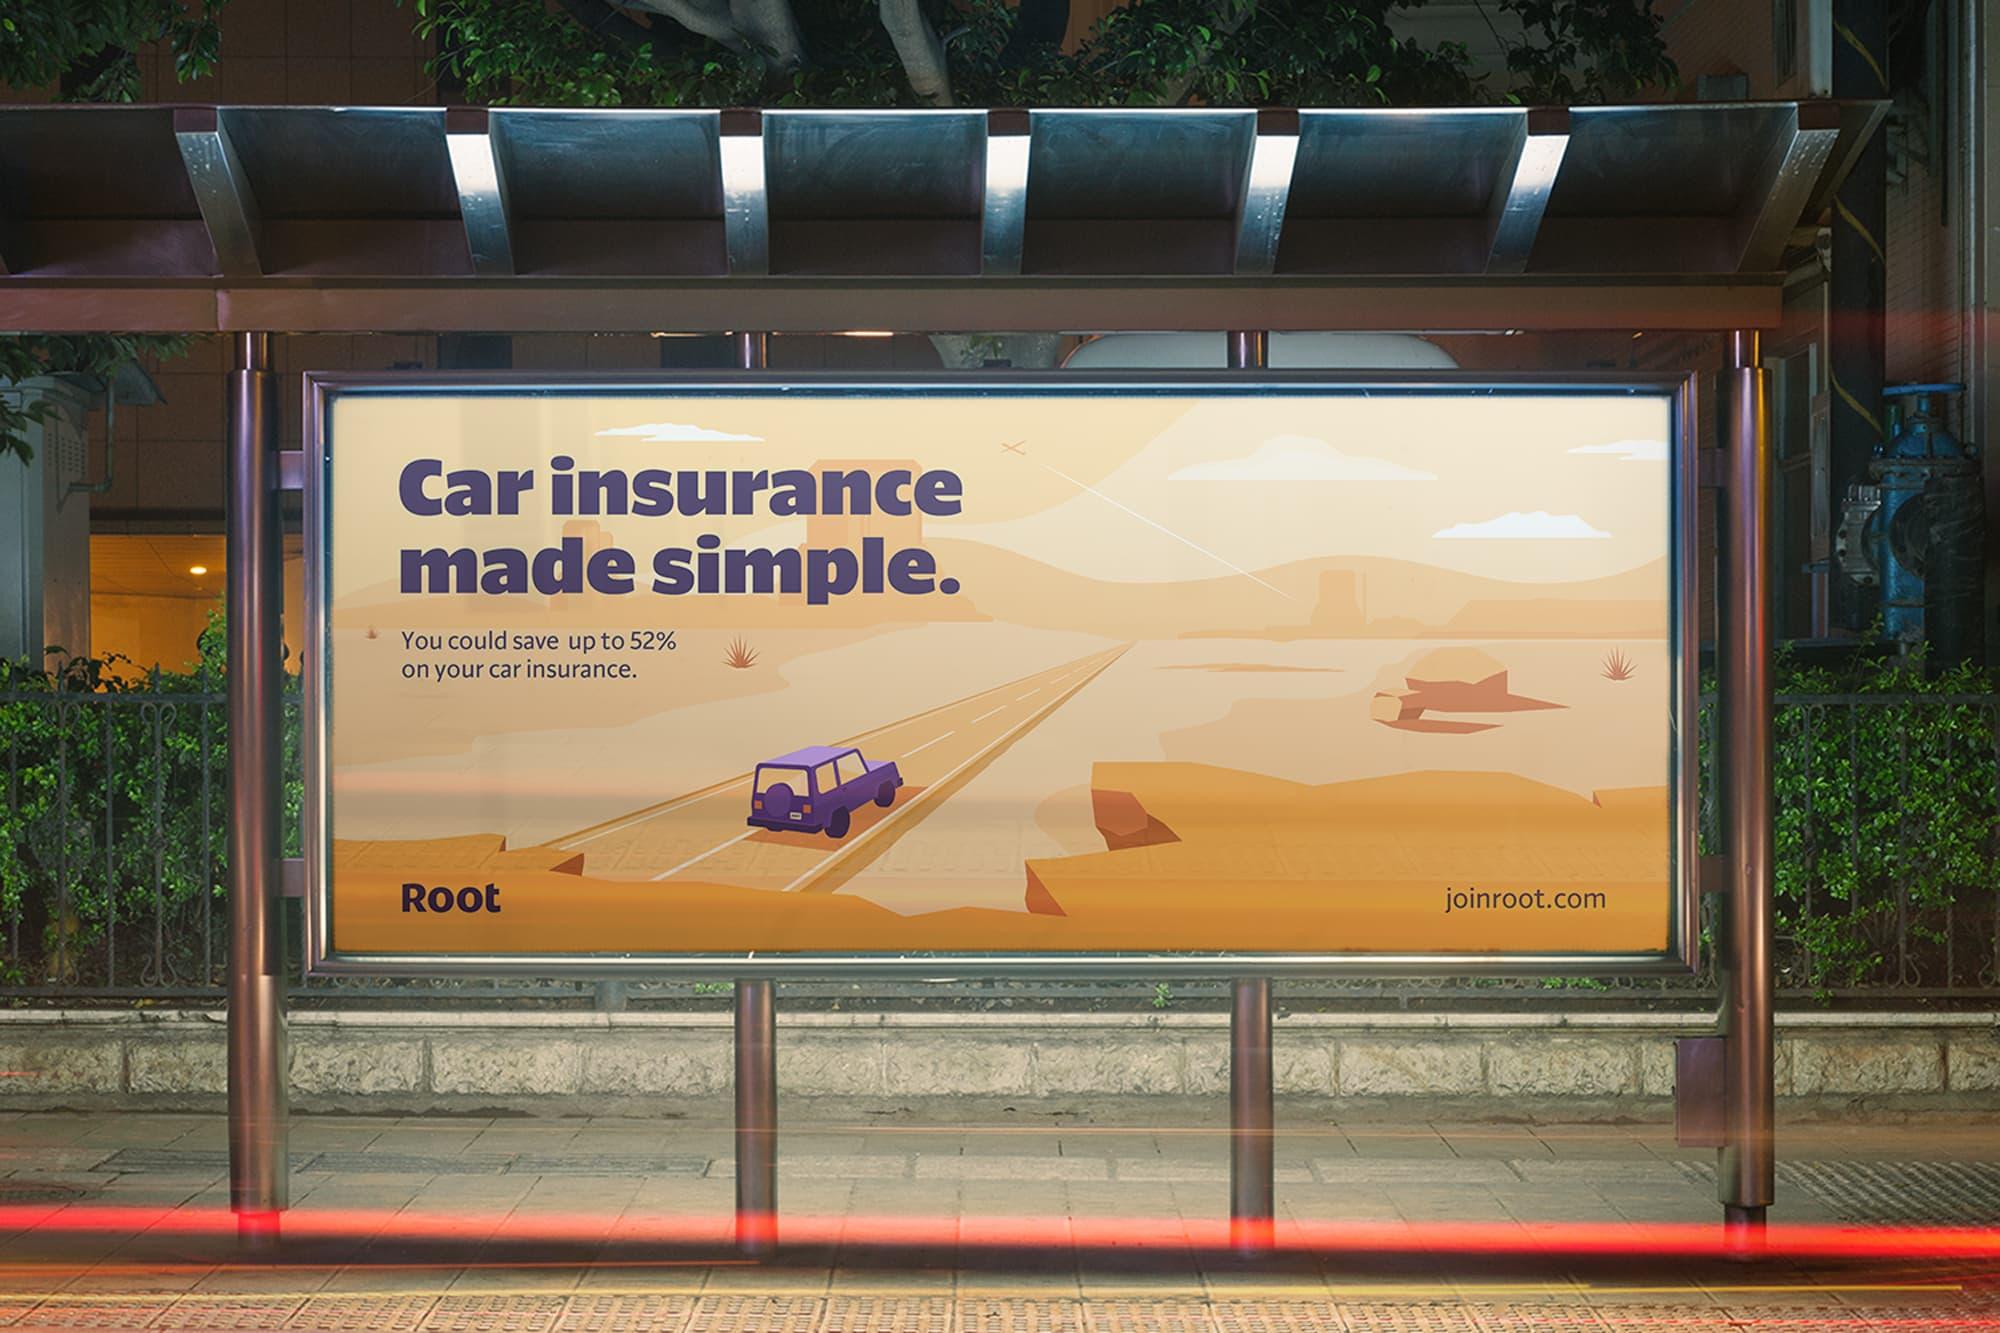 freight-root-insurance-15.jpg